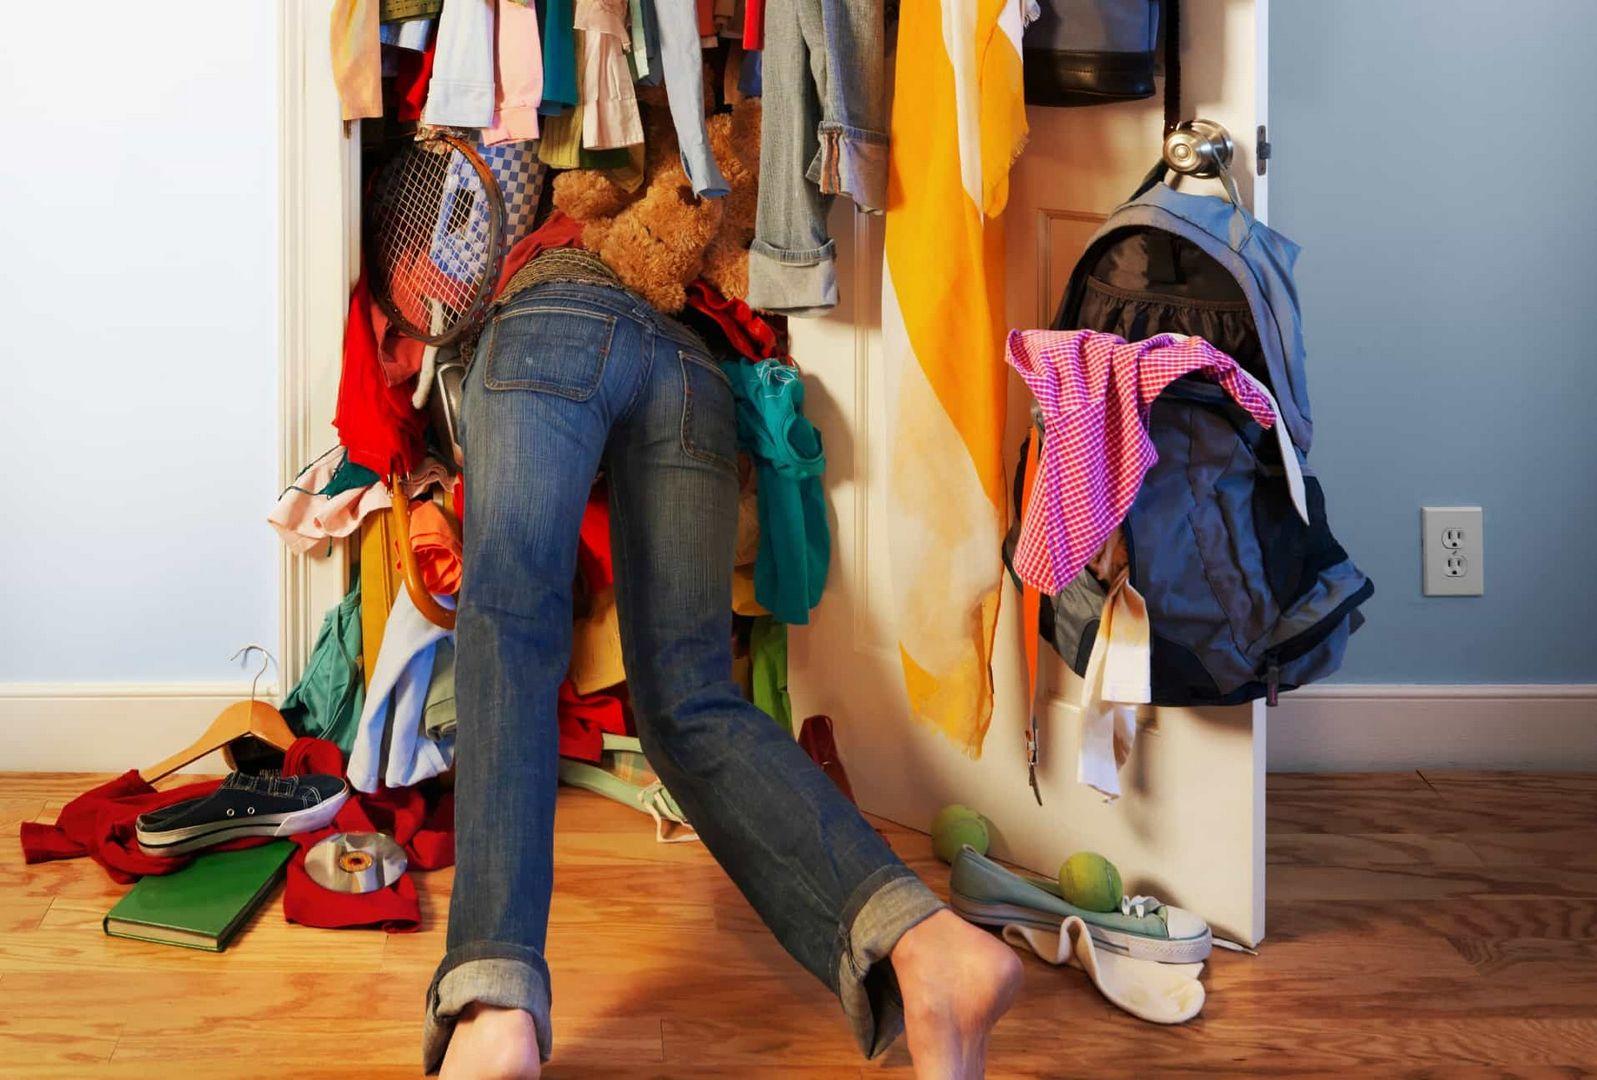 гардероб вещи